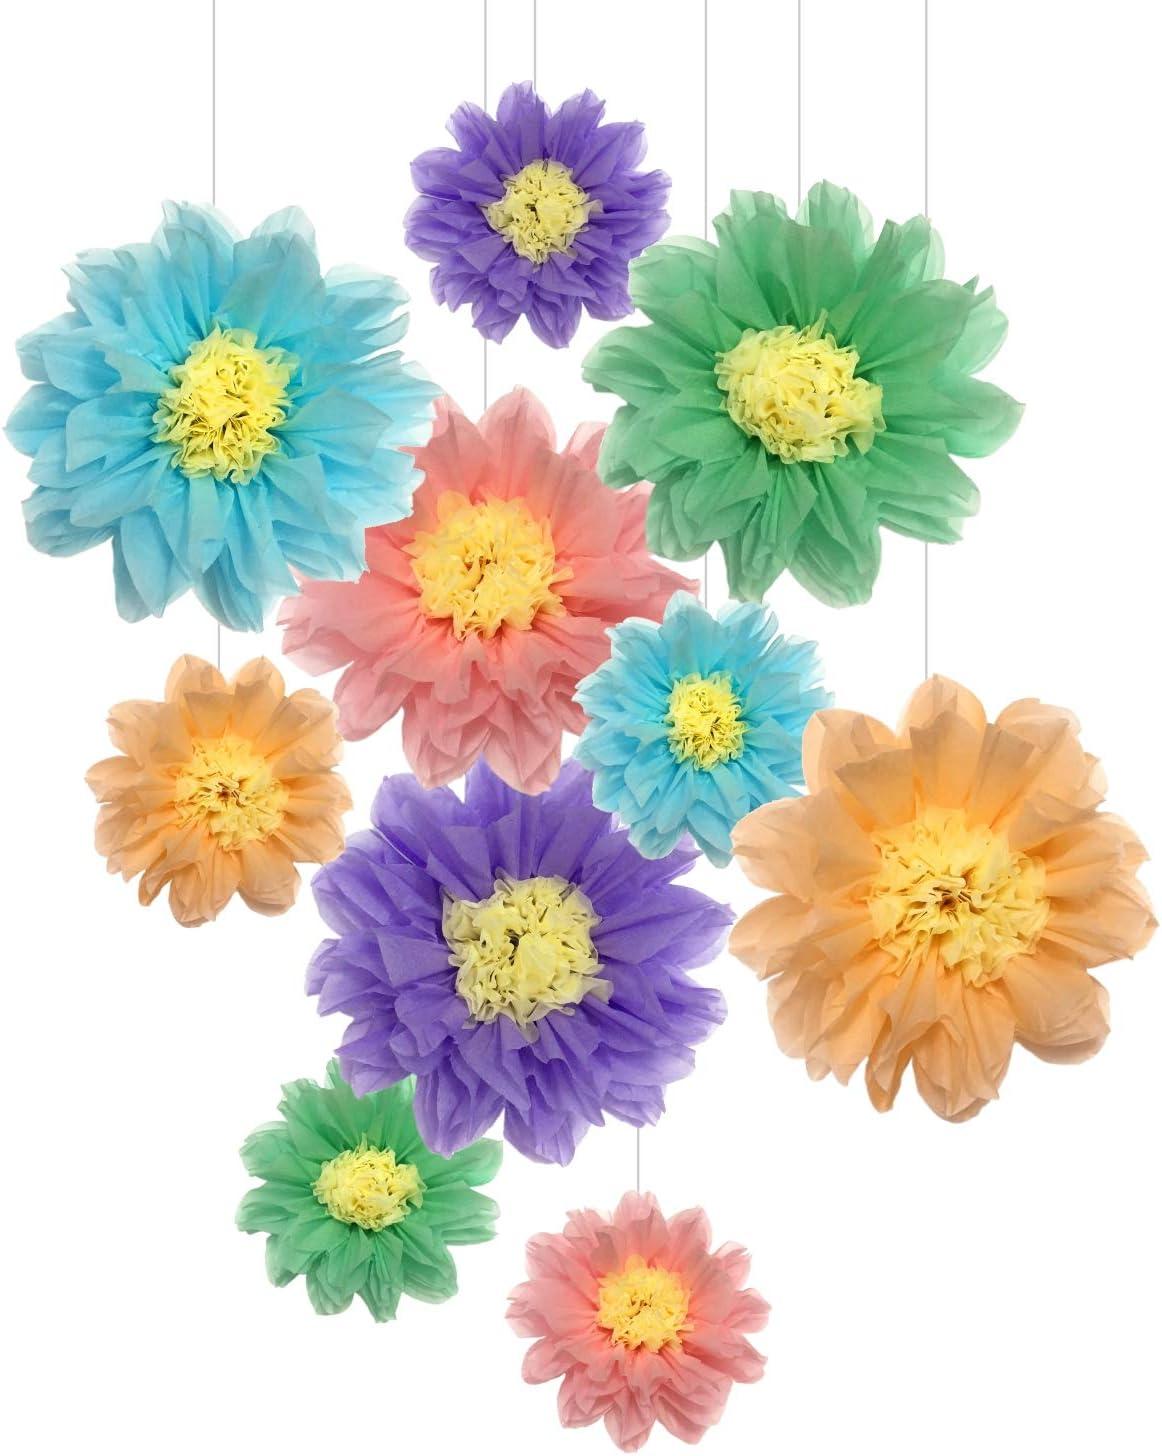 Amazon Com Tissue Paper Flowers Decorations Paper Pom Poms For